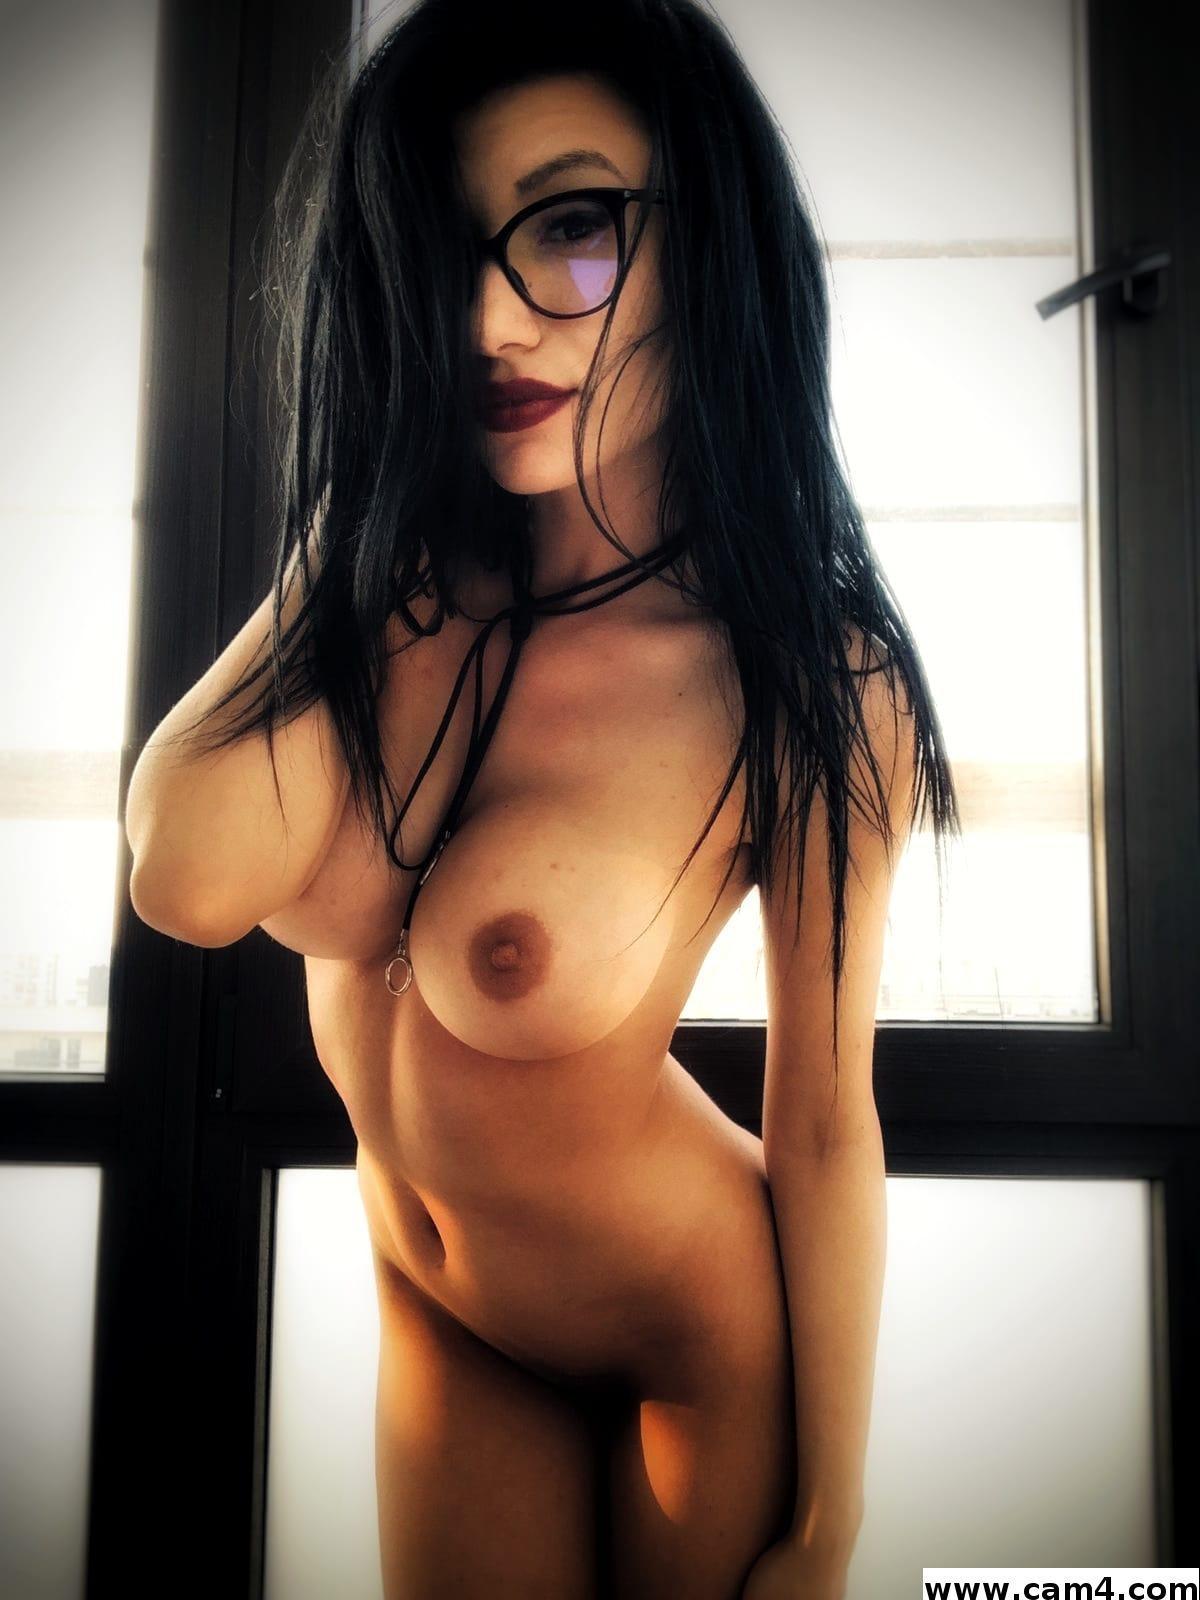 can lesbian massage ebony porno remarkable, the